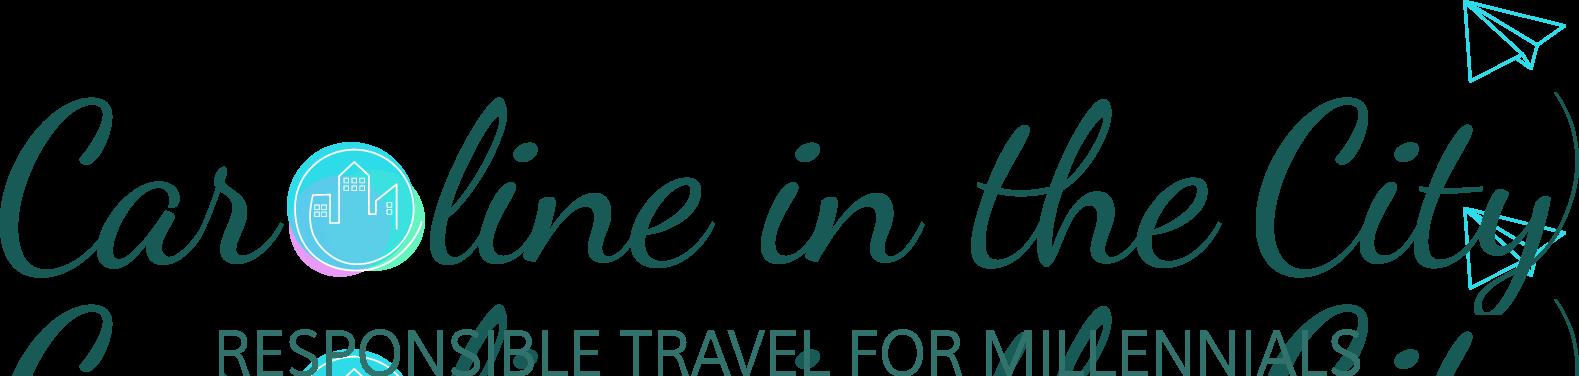 Caroline in the City Travel Blog